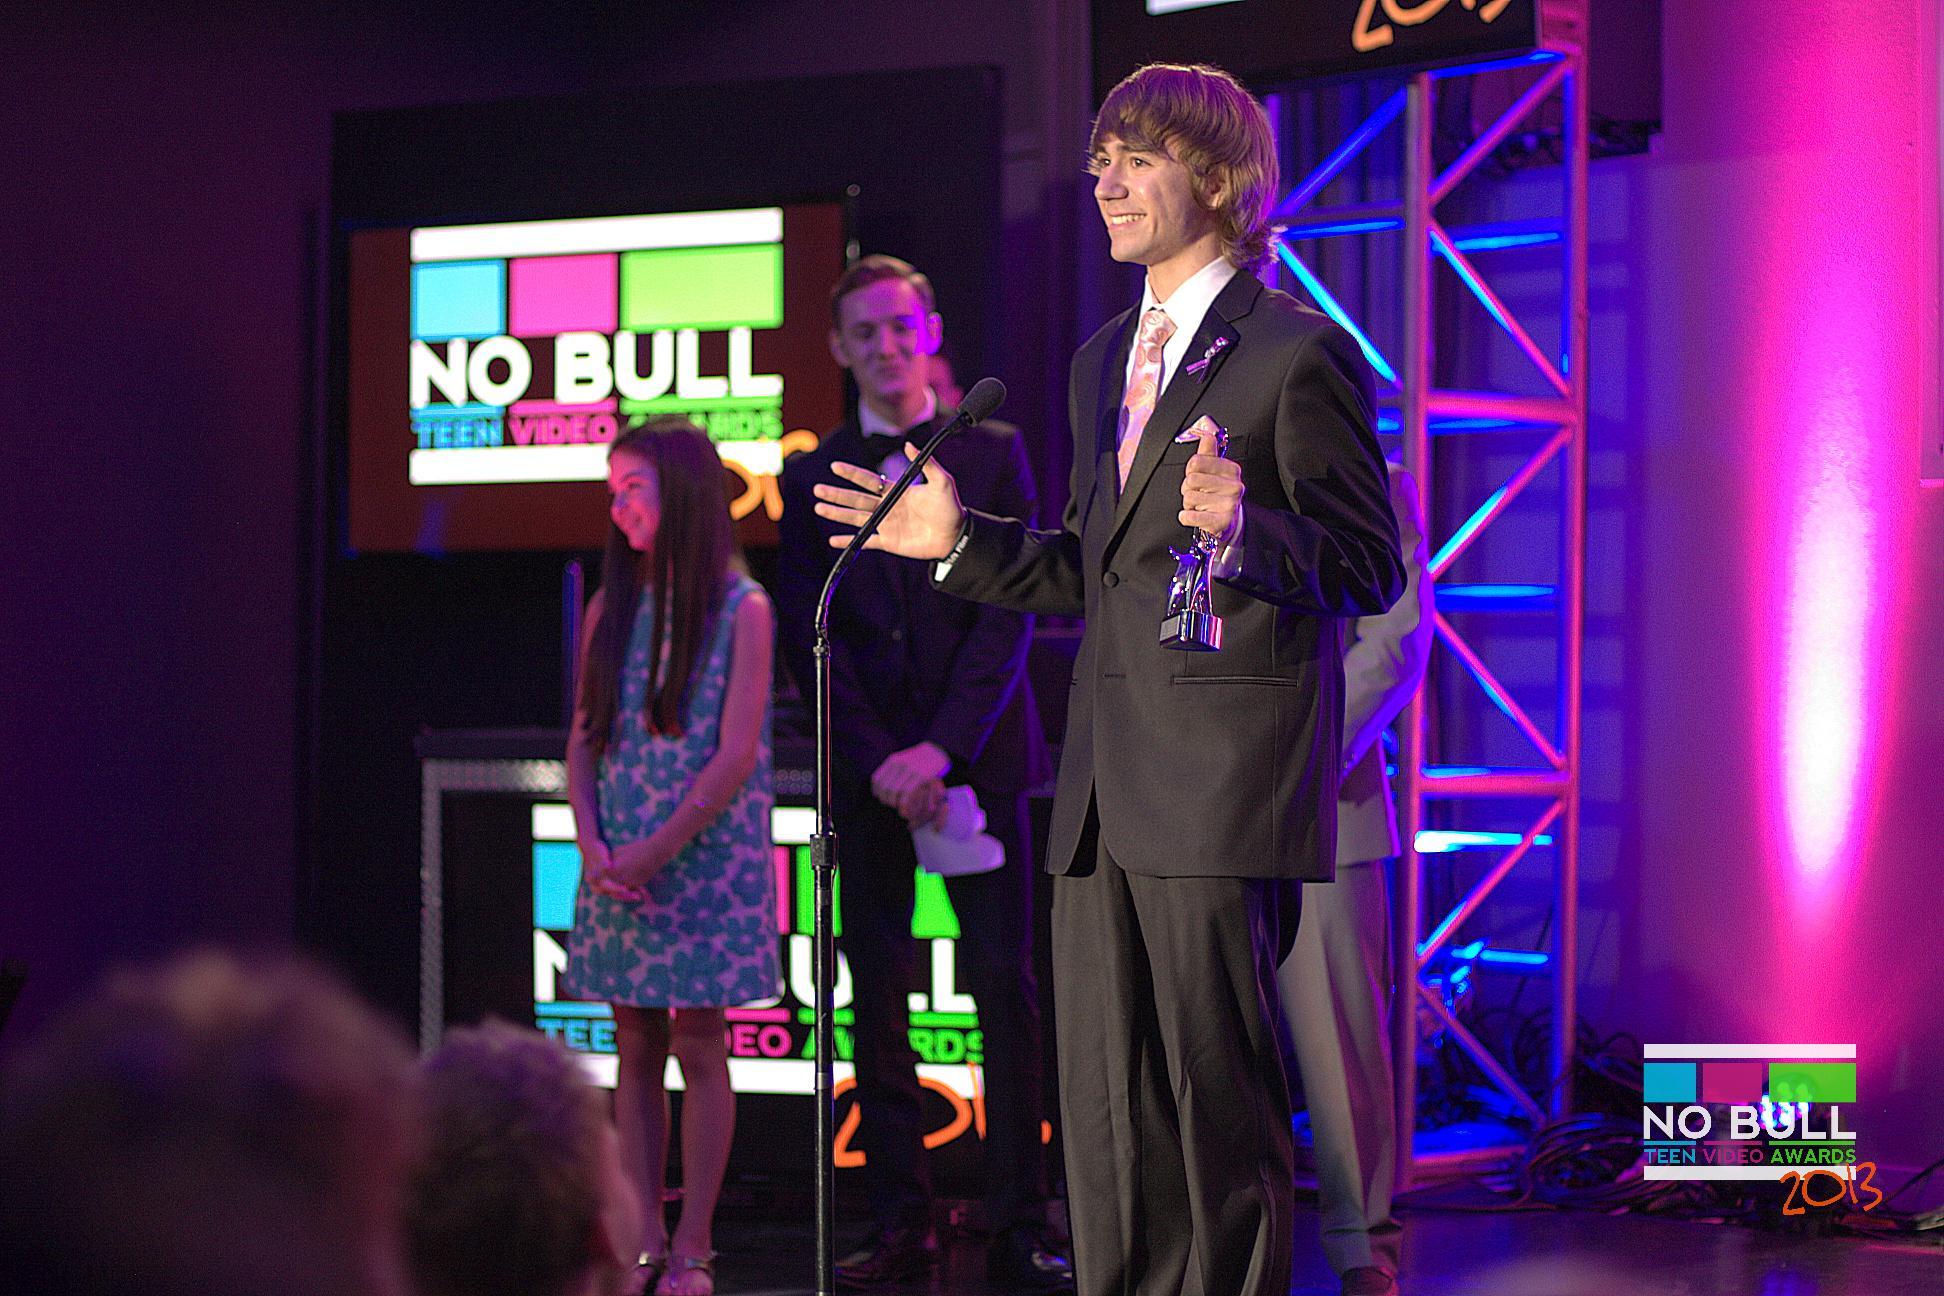 2013 Teen Video Awards